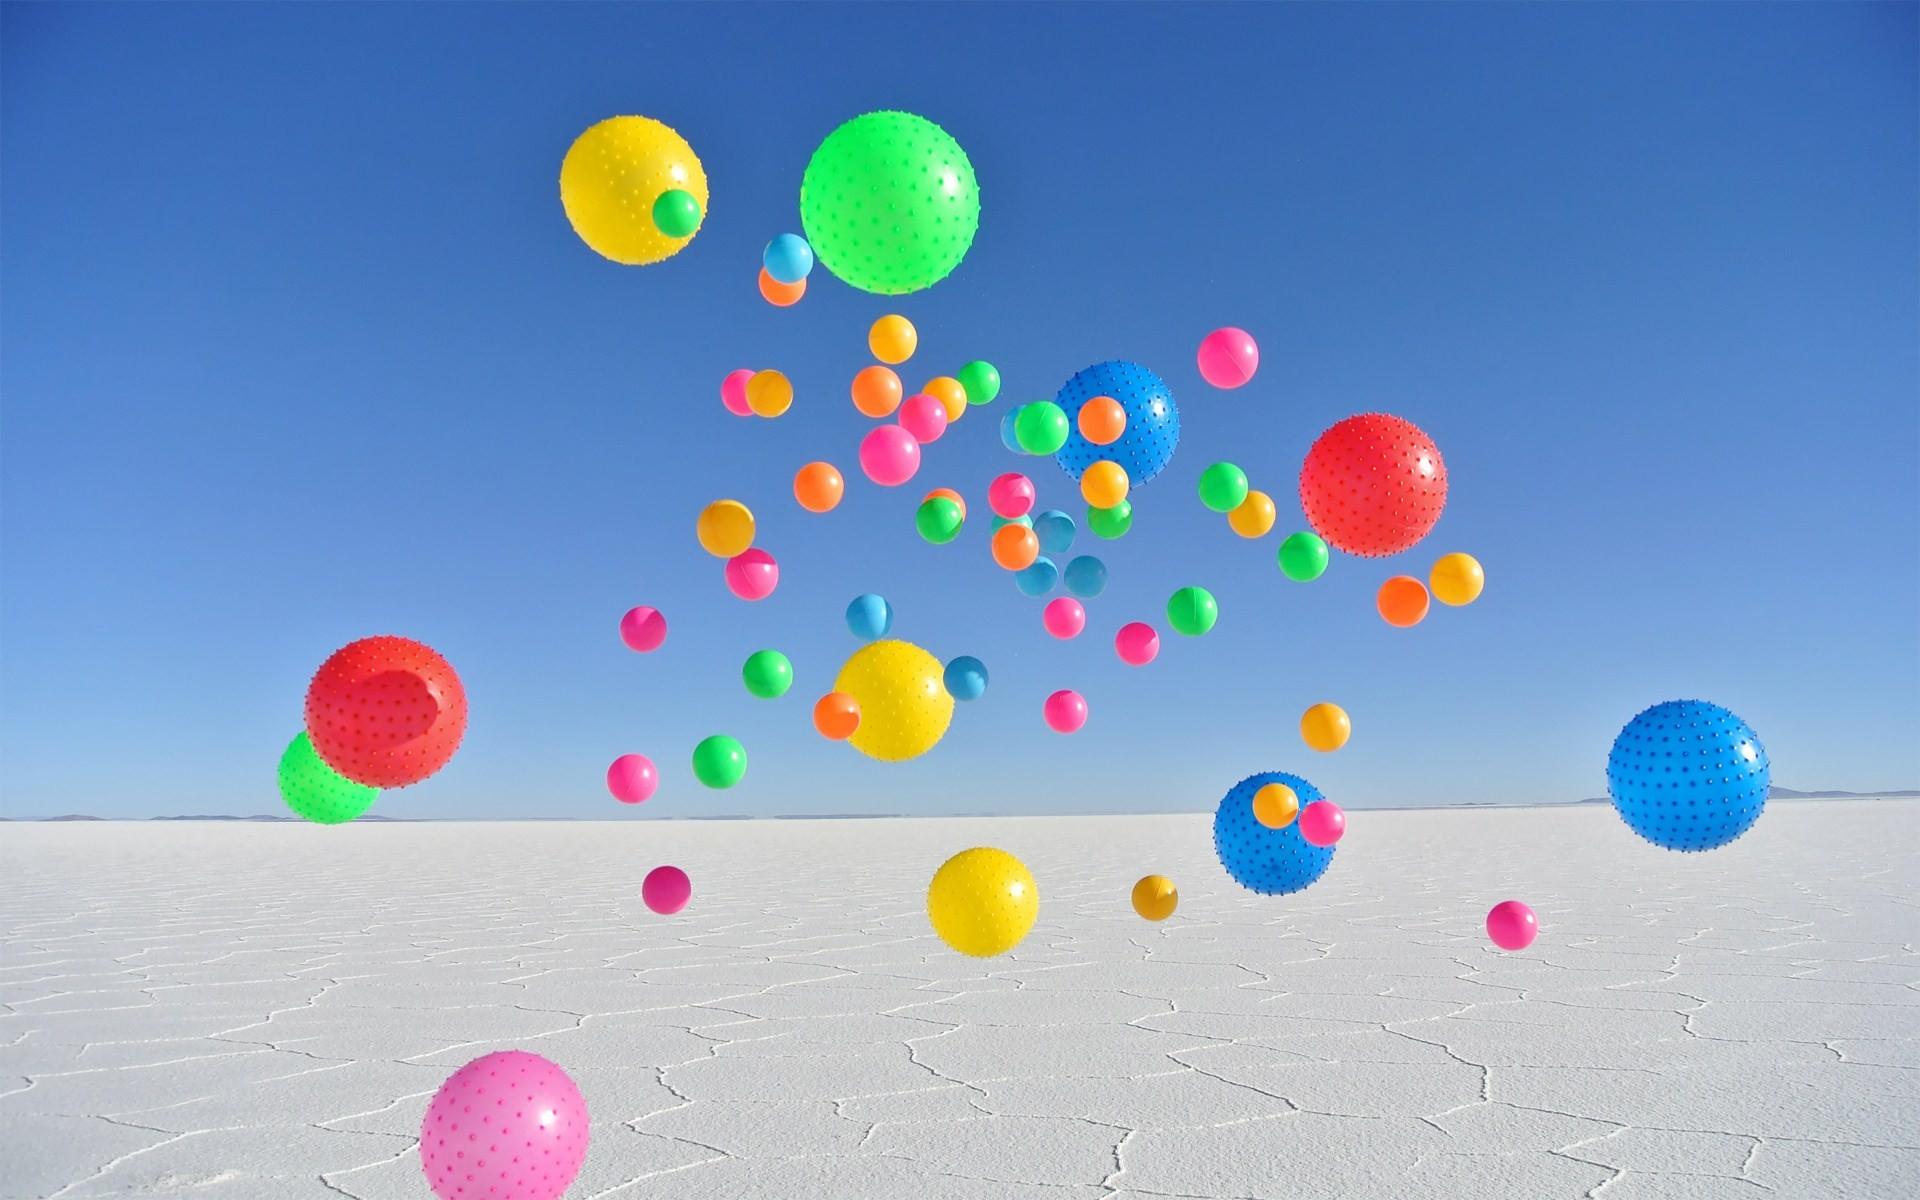 Moving Bubbles Desktop Wallpaper – WallpaperSafari